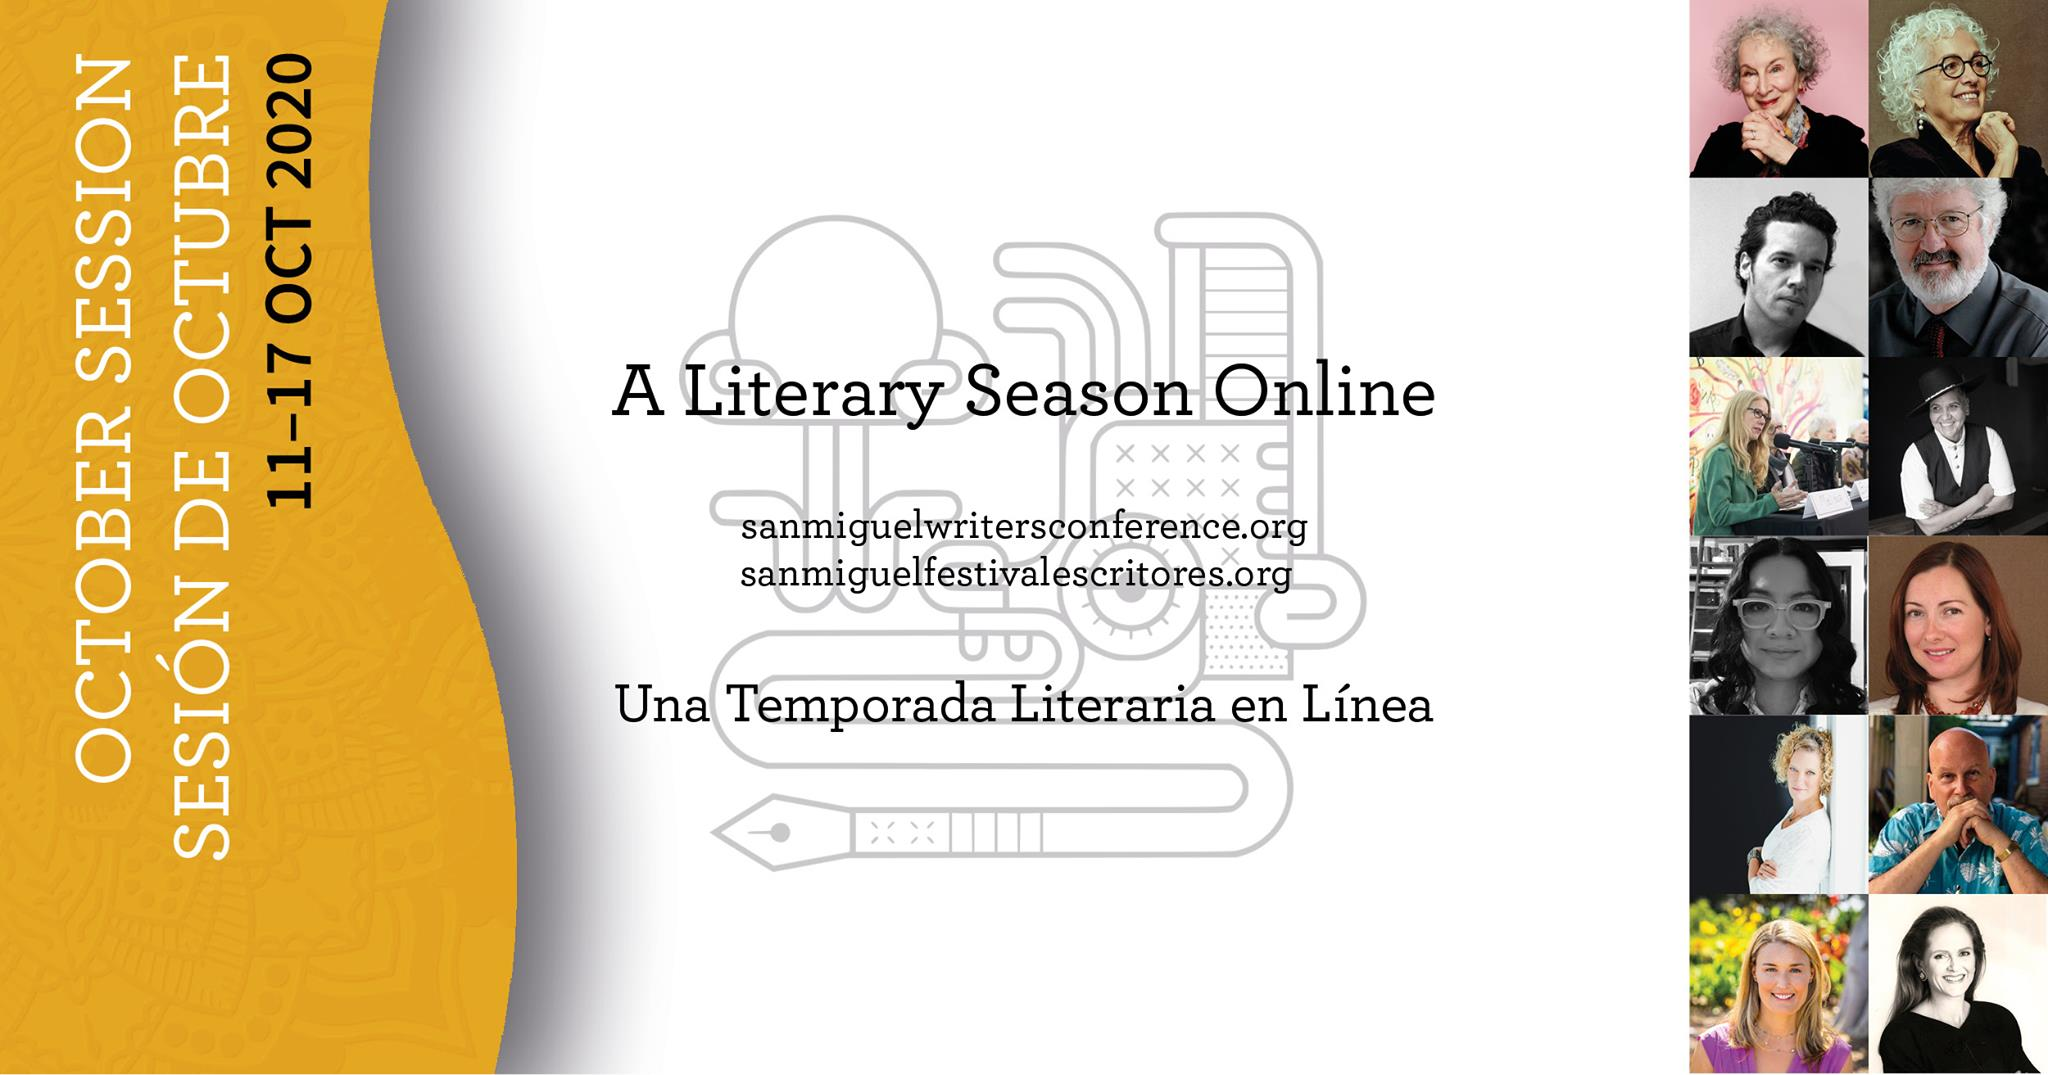 a-literary-season-online.jpg